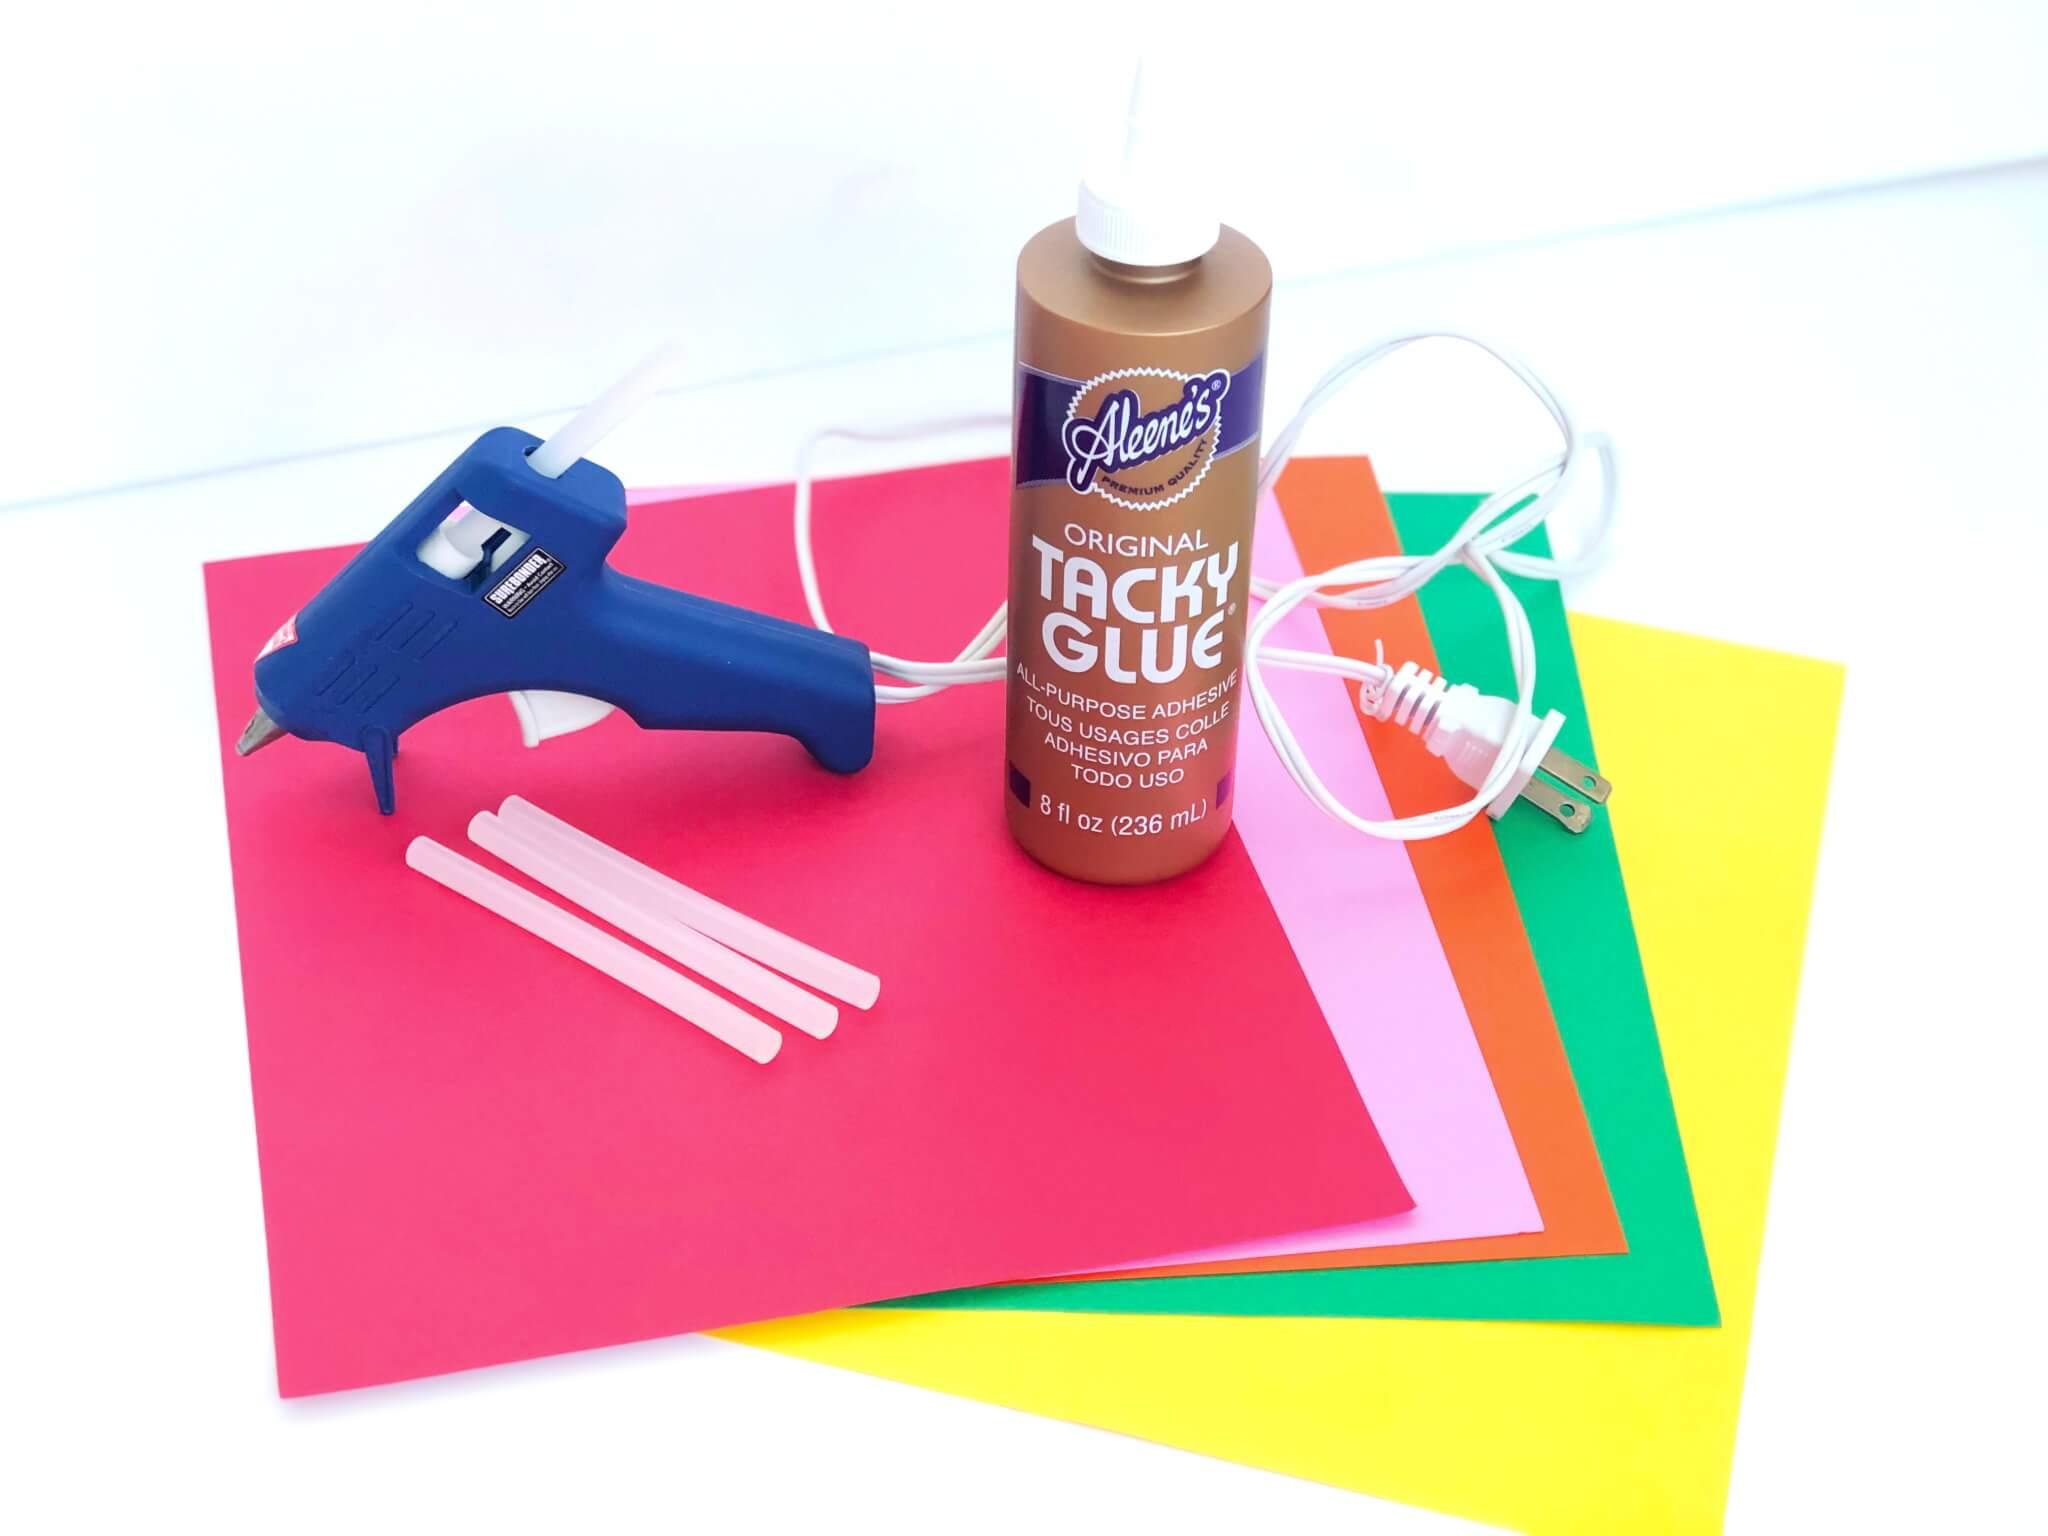 Craft supply list with Glue gun and Tacky glue